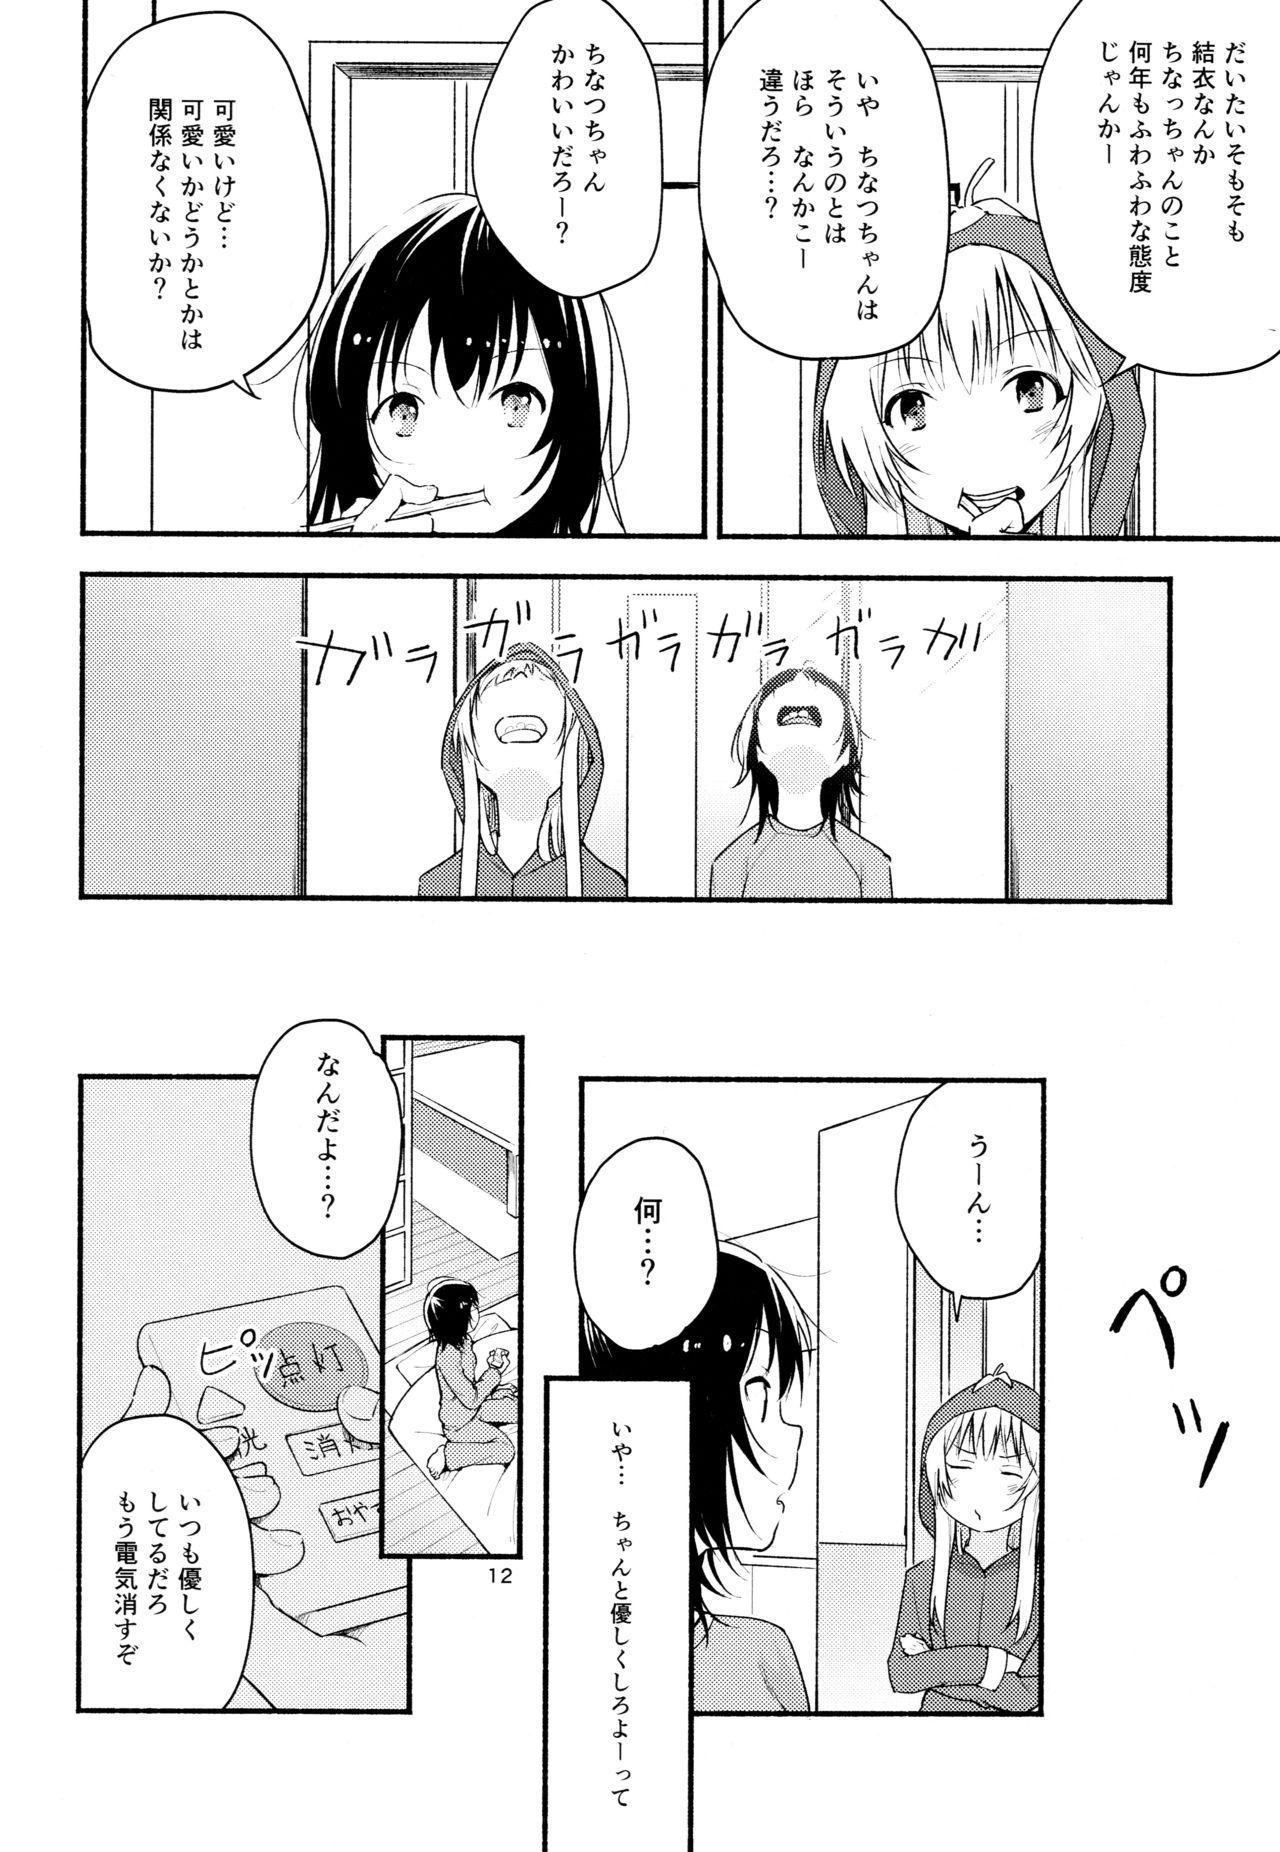 (Girls Love Festival 16) [G-complex (YUI_7)] Kyou mo Ashita mo Yurui Hibi o - Yui and Kyoko and forever loose day-to-day (YuruYuri) 10